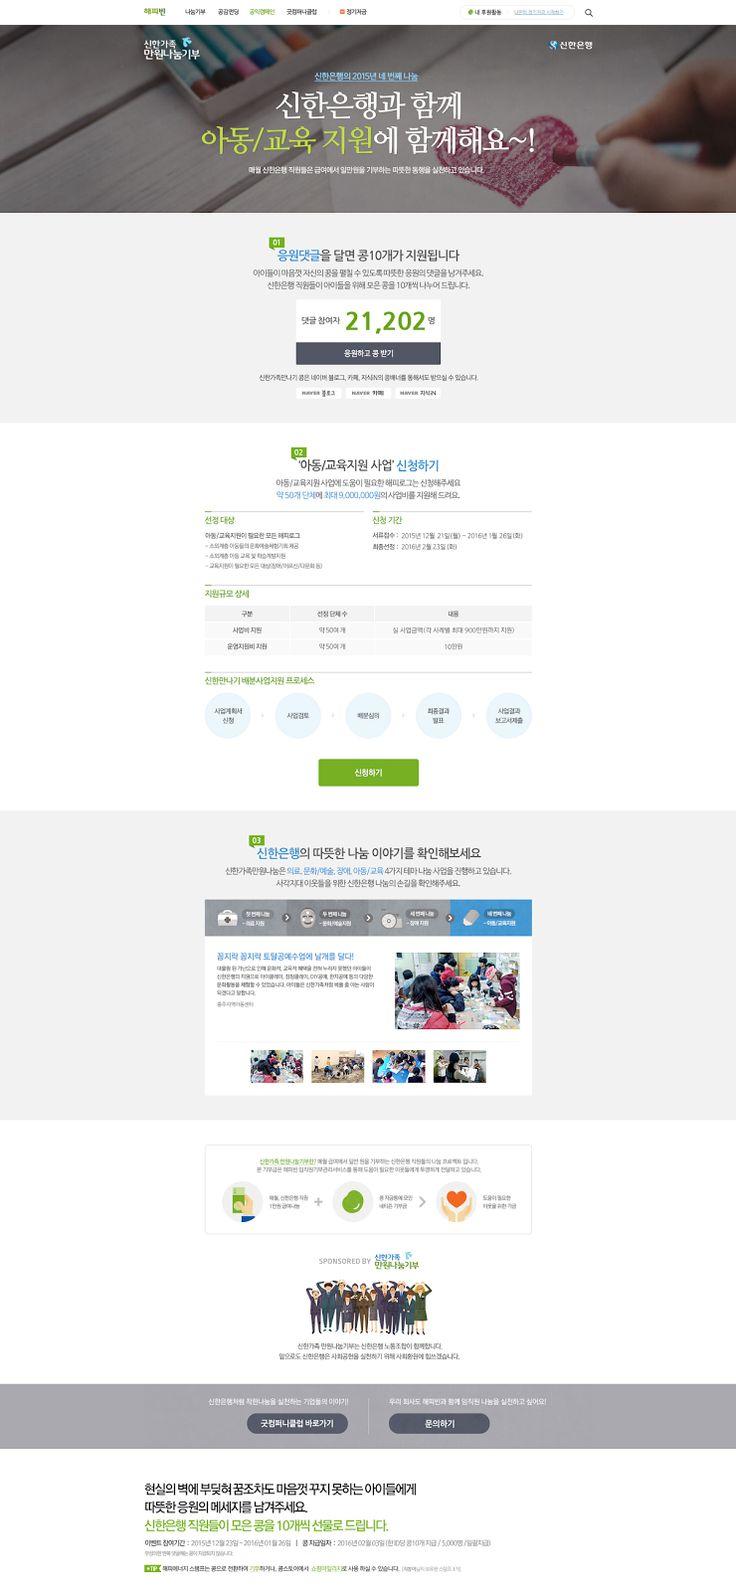 Gpresss: 신한은행 아동/교육 지원 캠페인